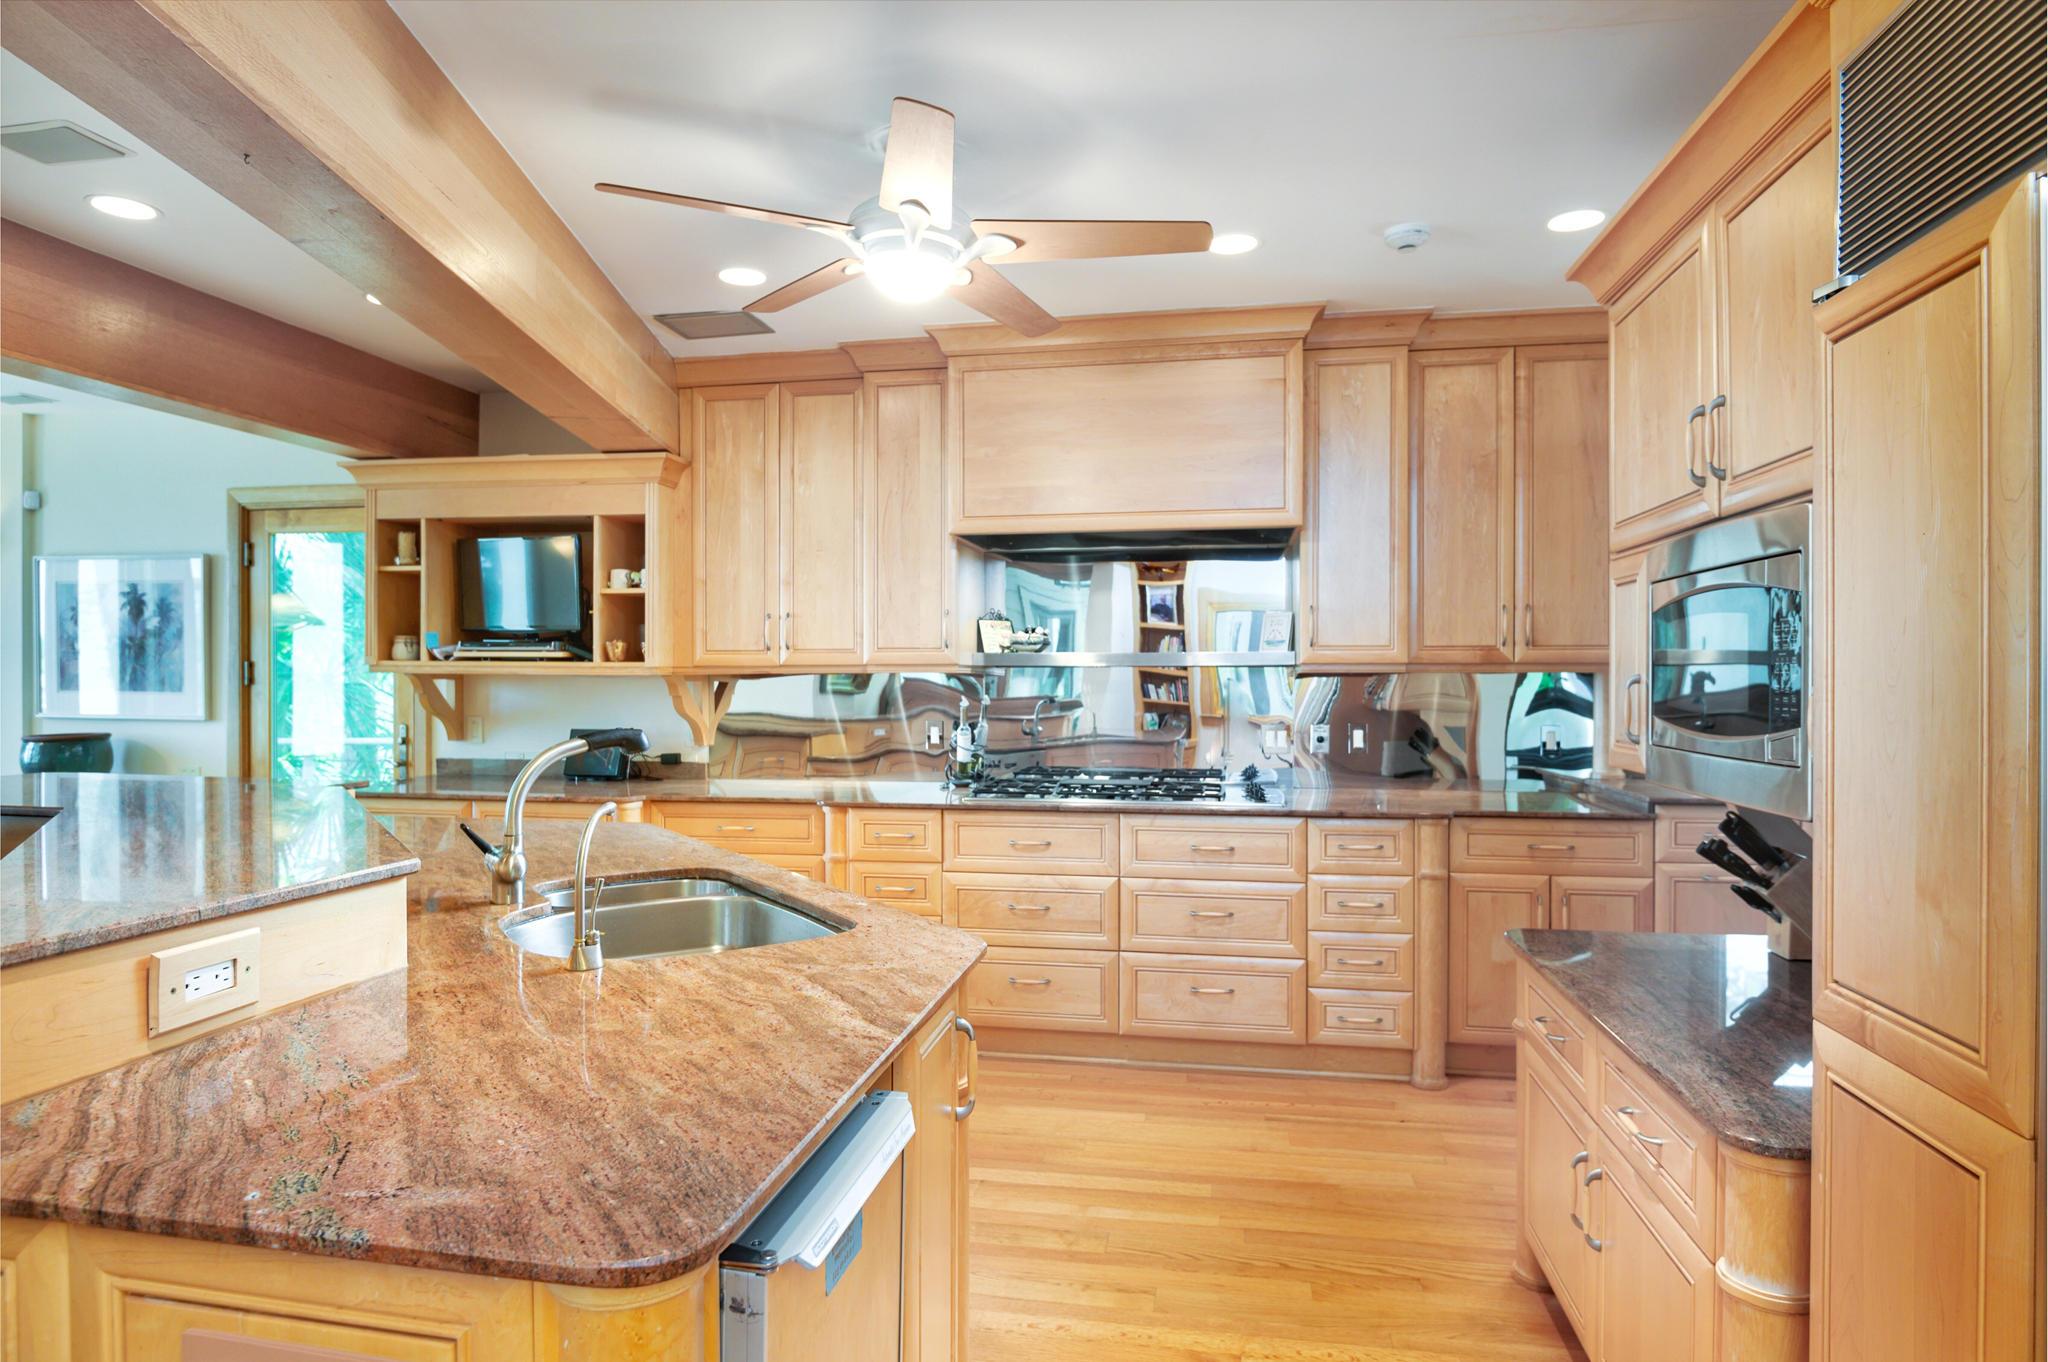 Seabrook Island Homes For Sale - 3087 Marshgate, Seabrook Island, SC - 24